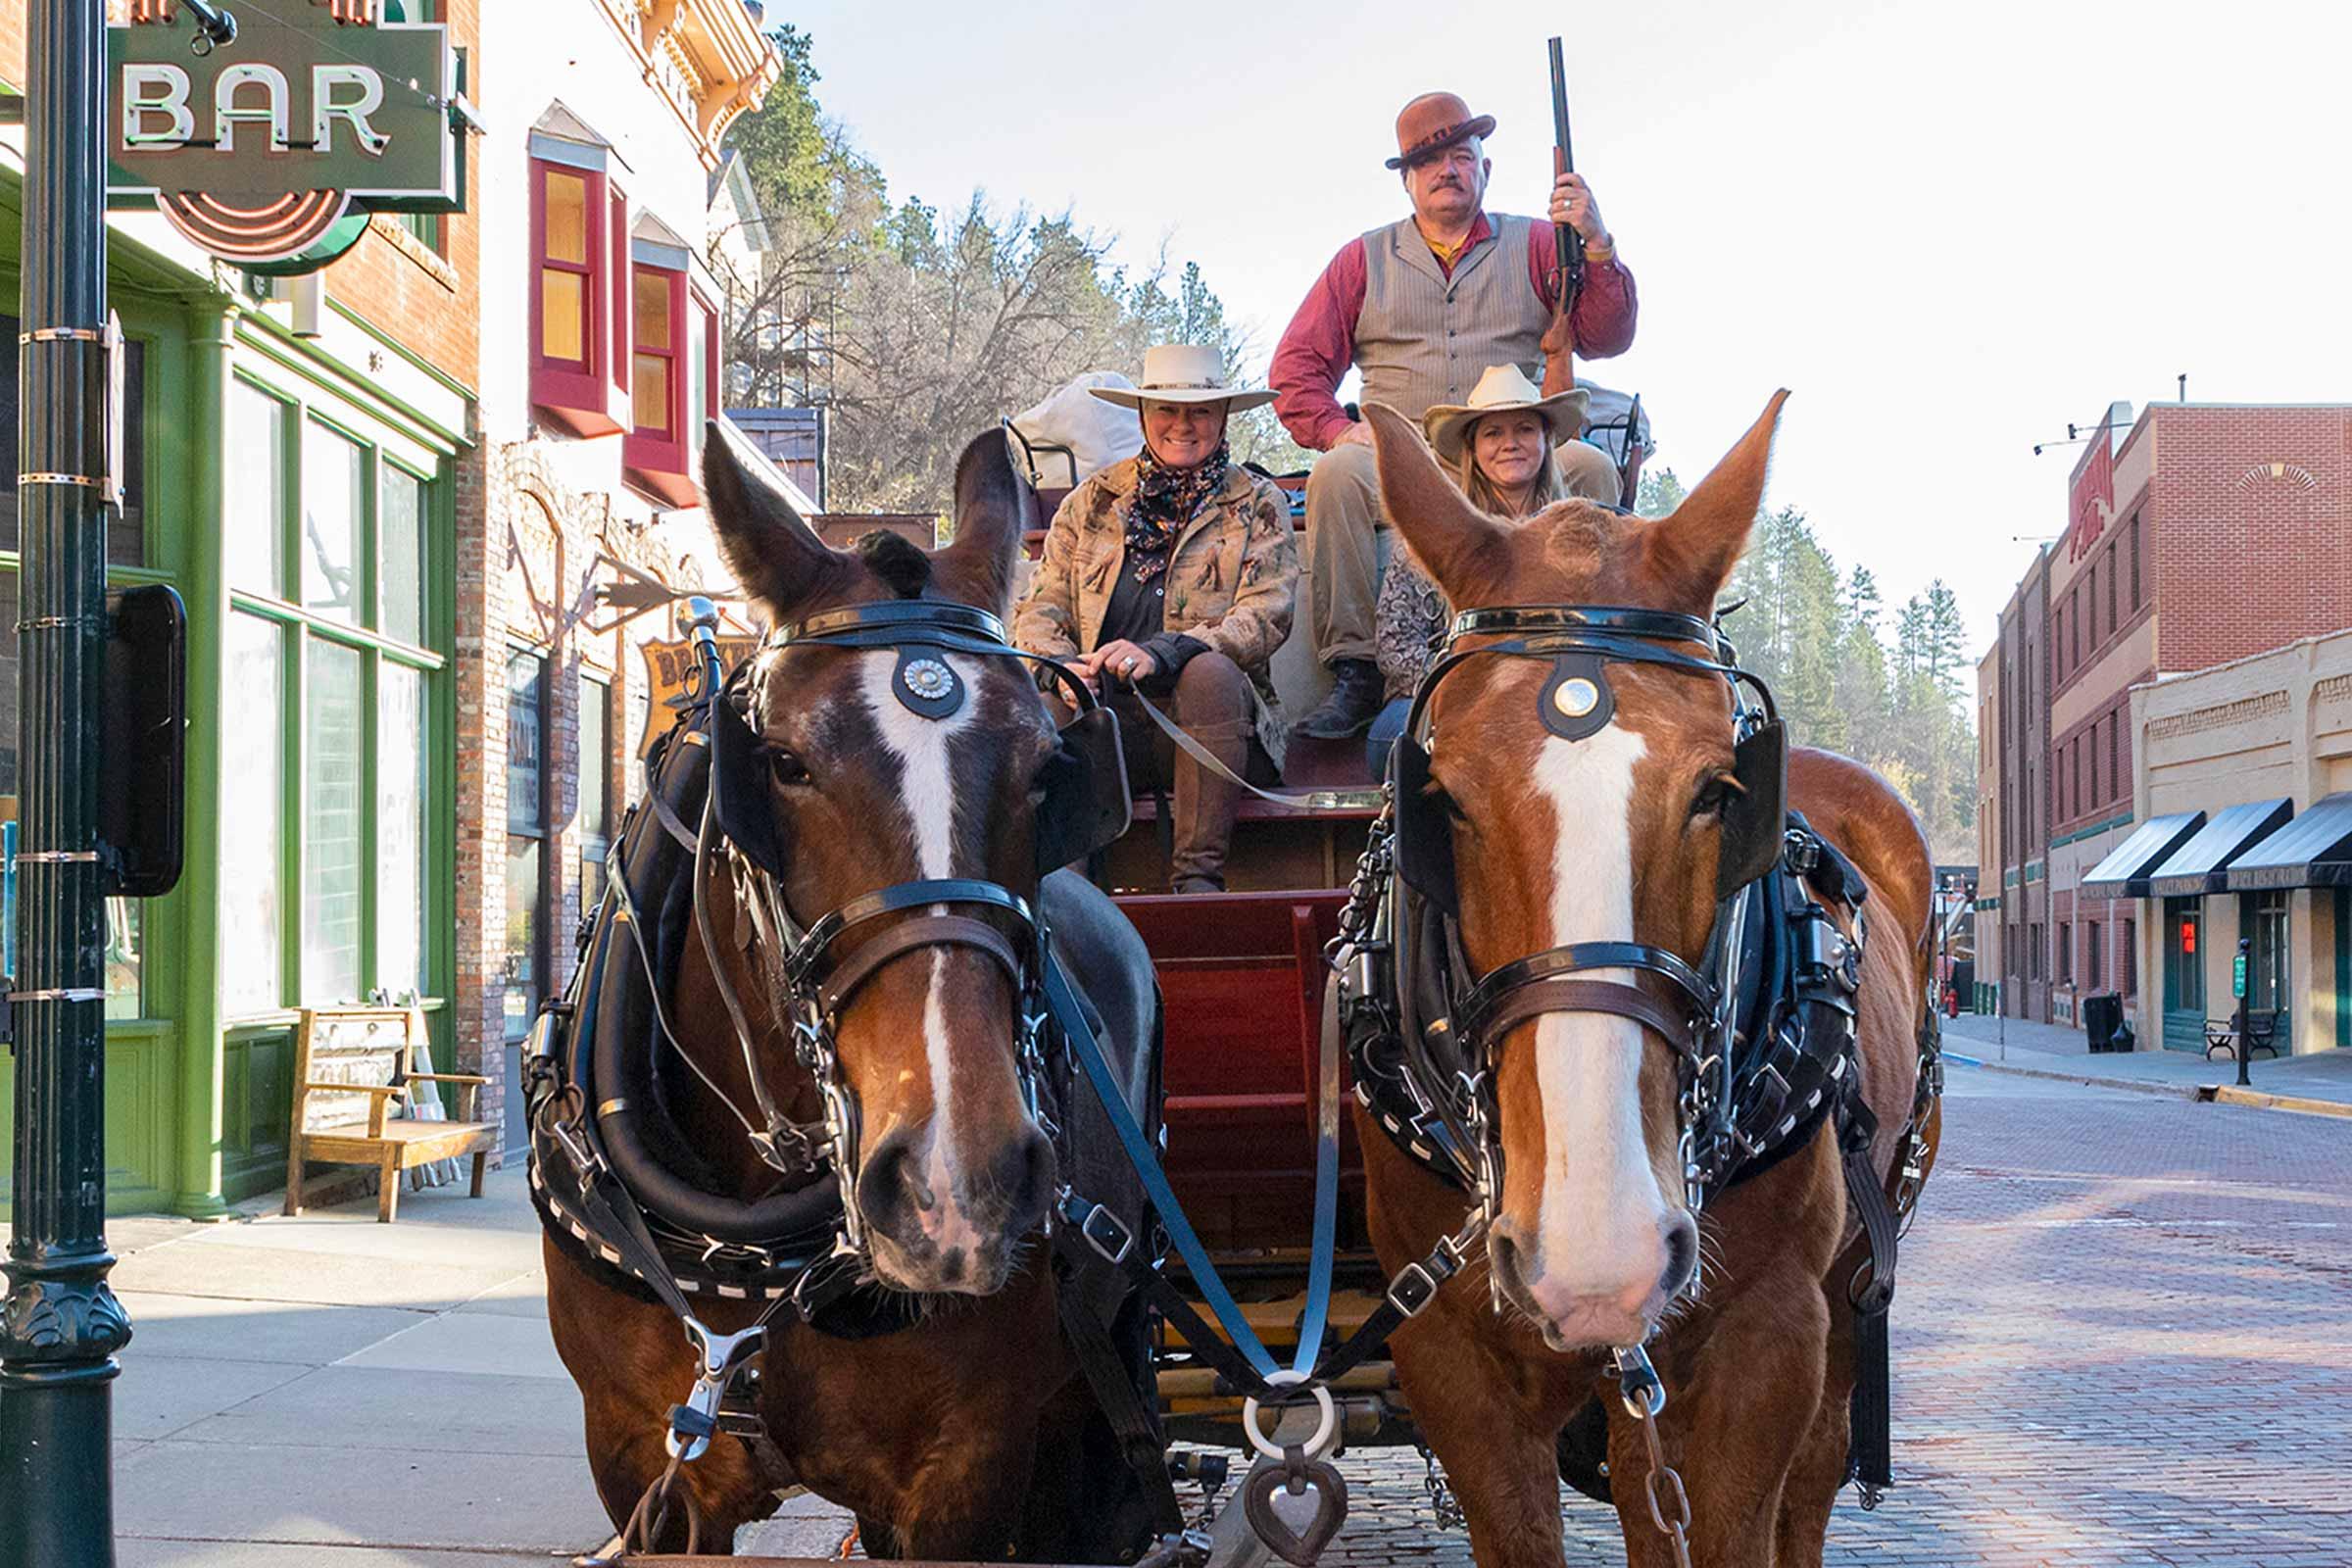 stagecoach rides